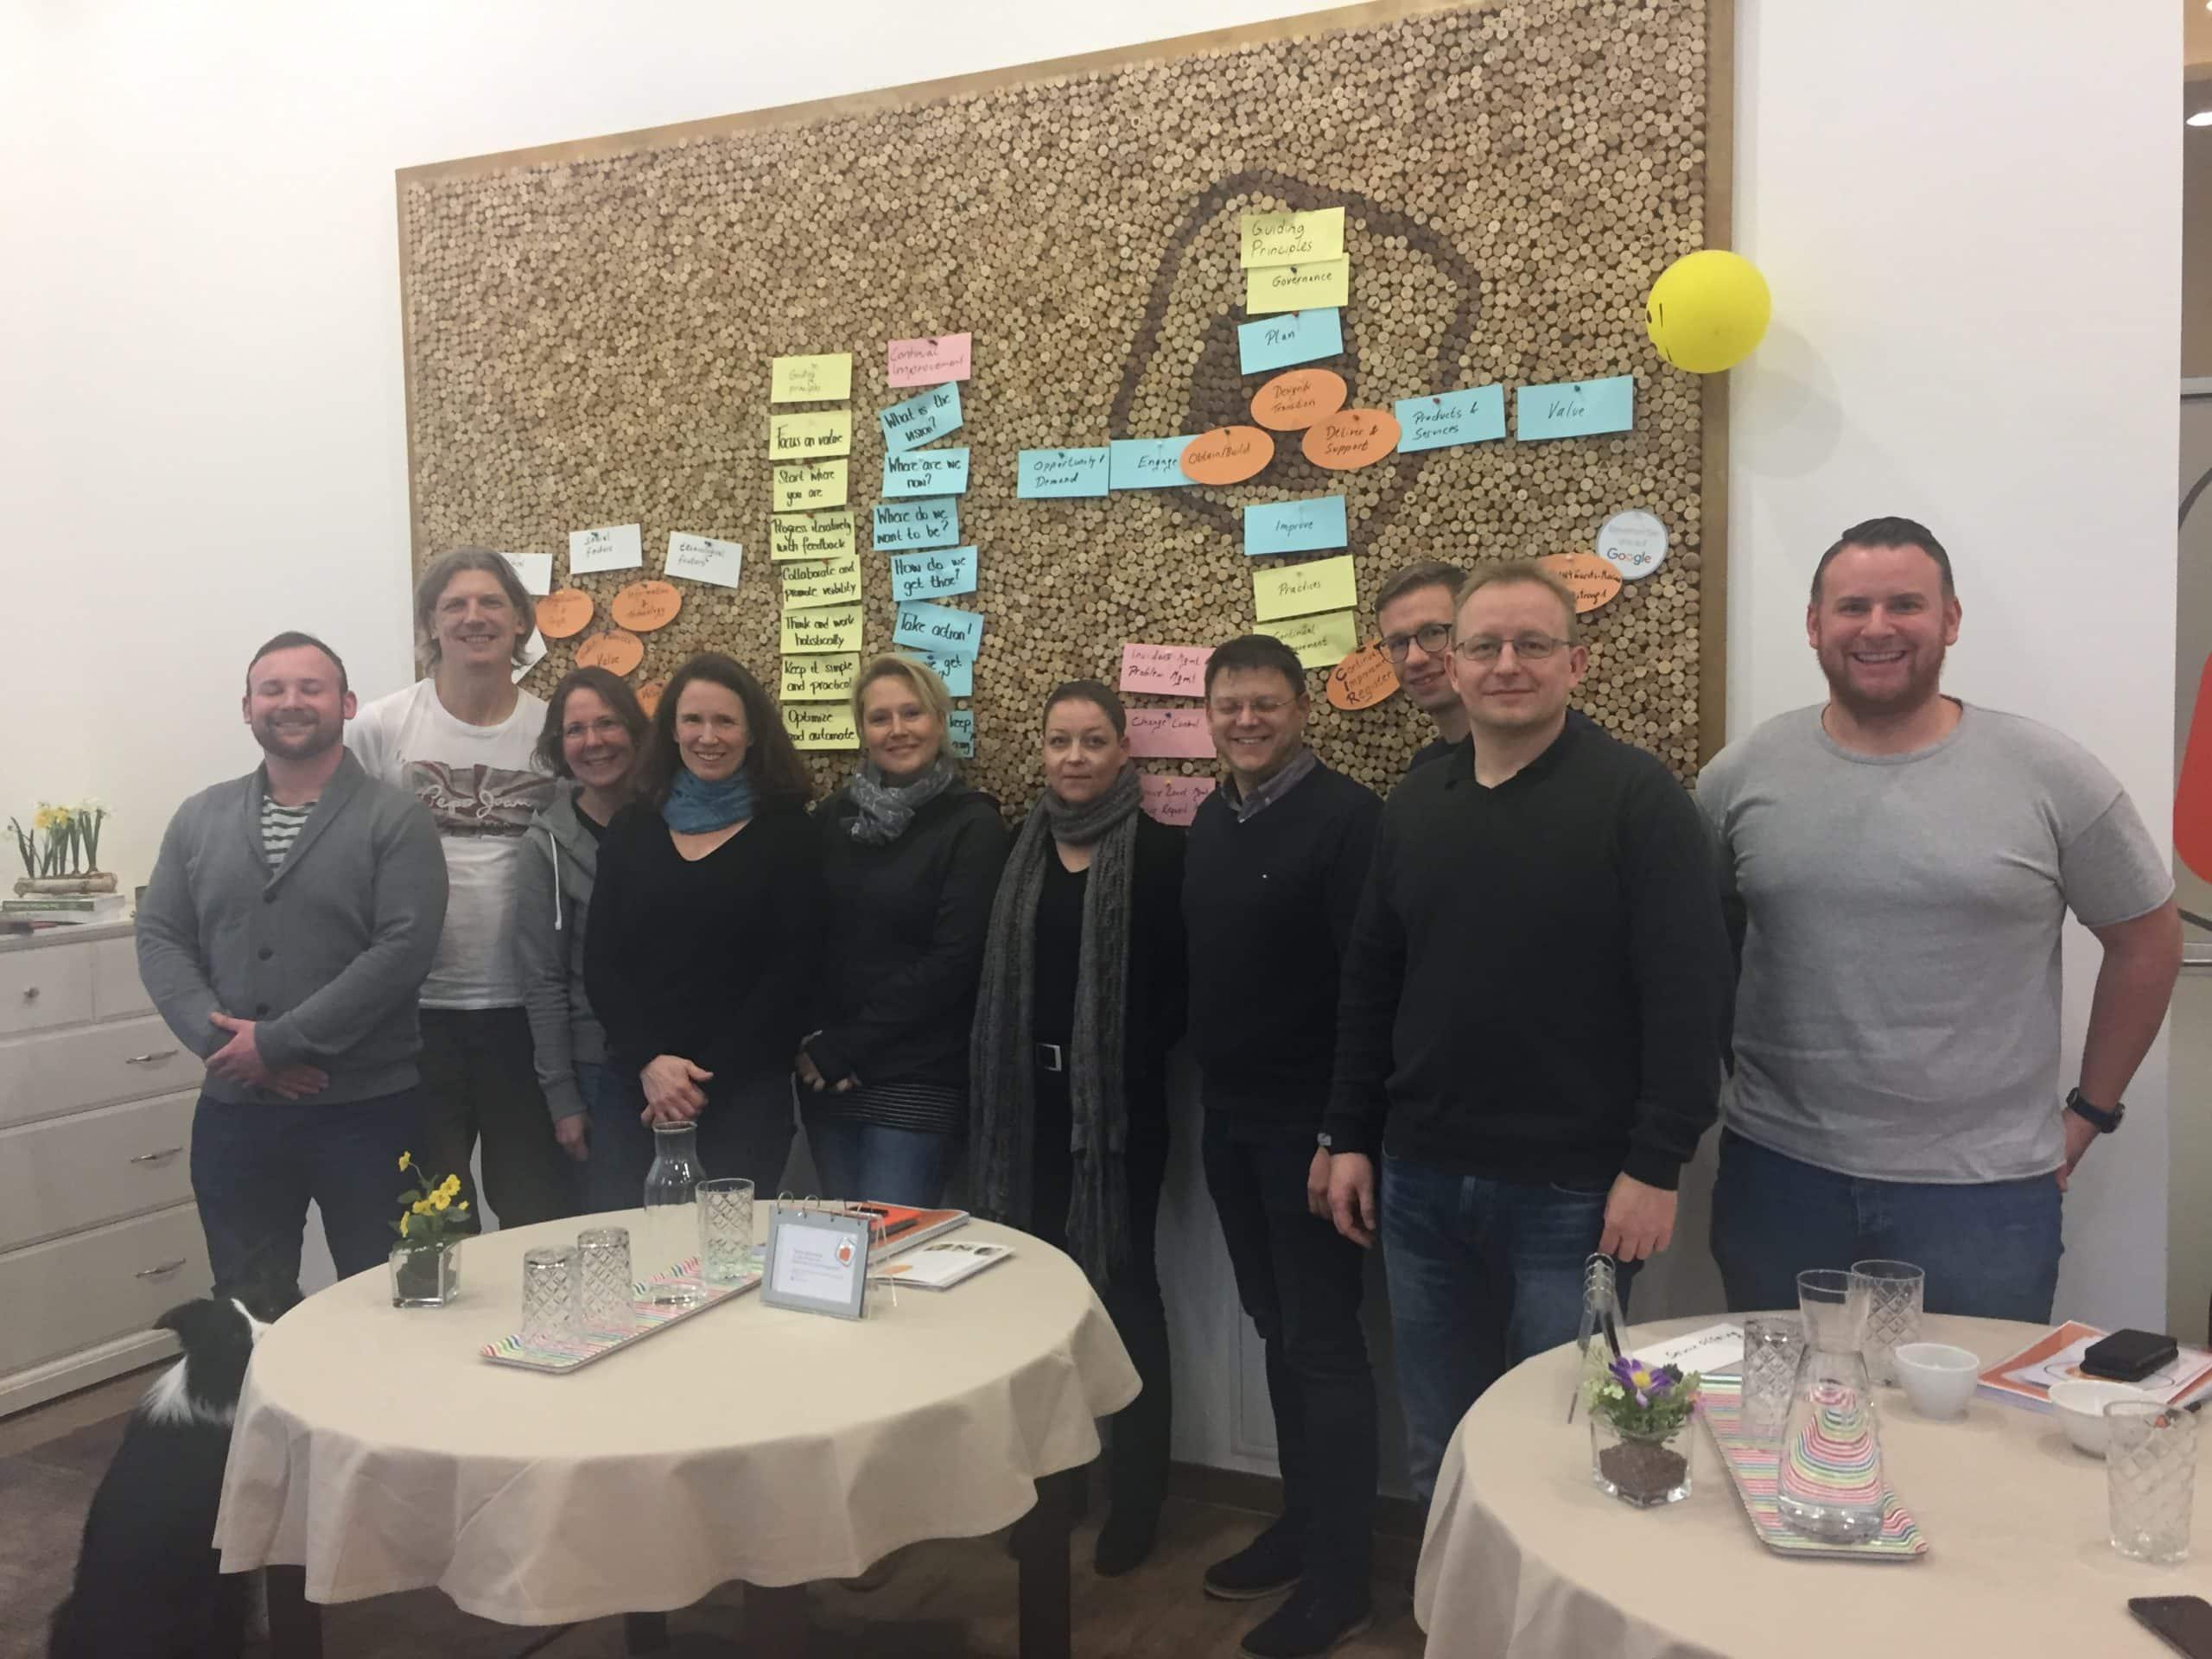 Teilnehmer des ITIL 4 Foundation Kurses bei ITSM Partner